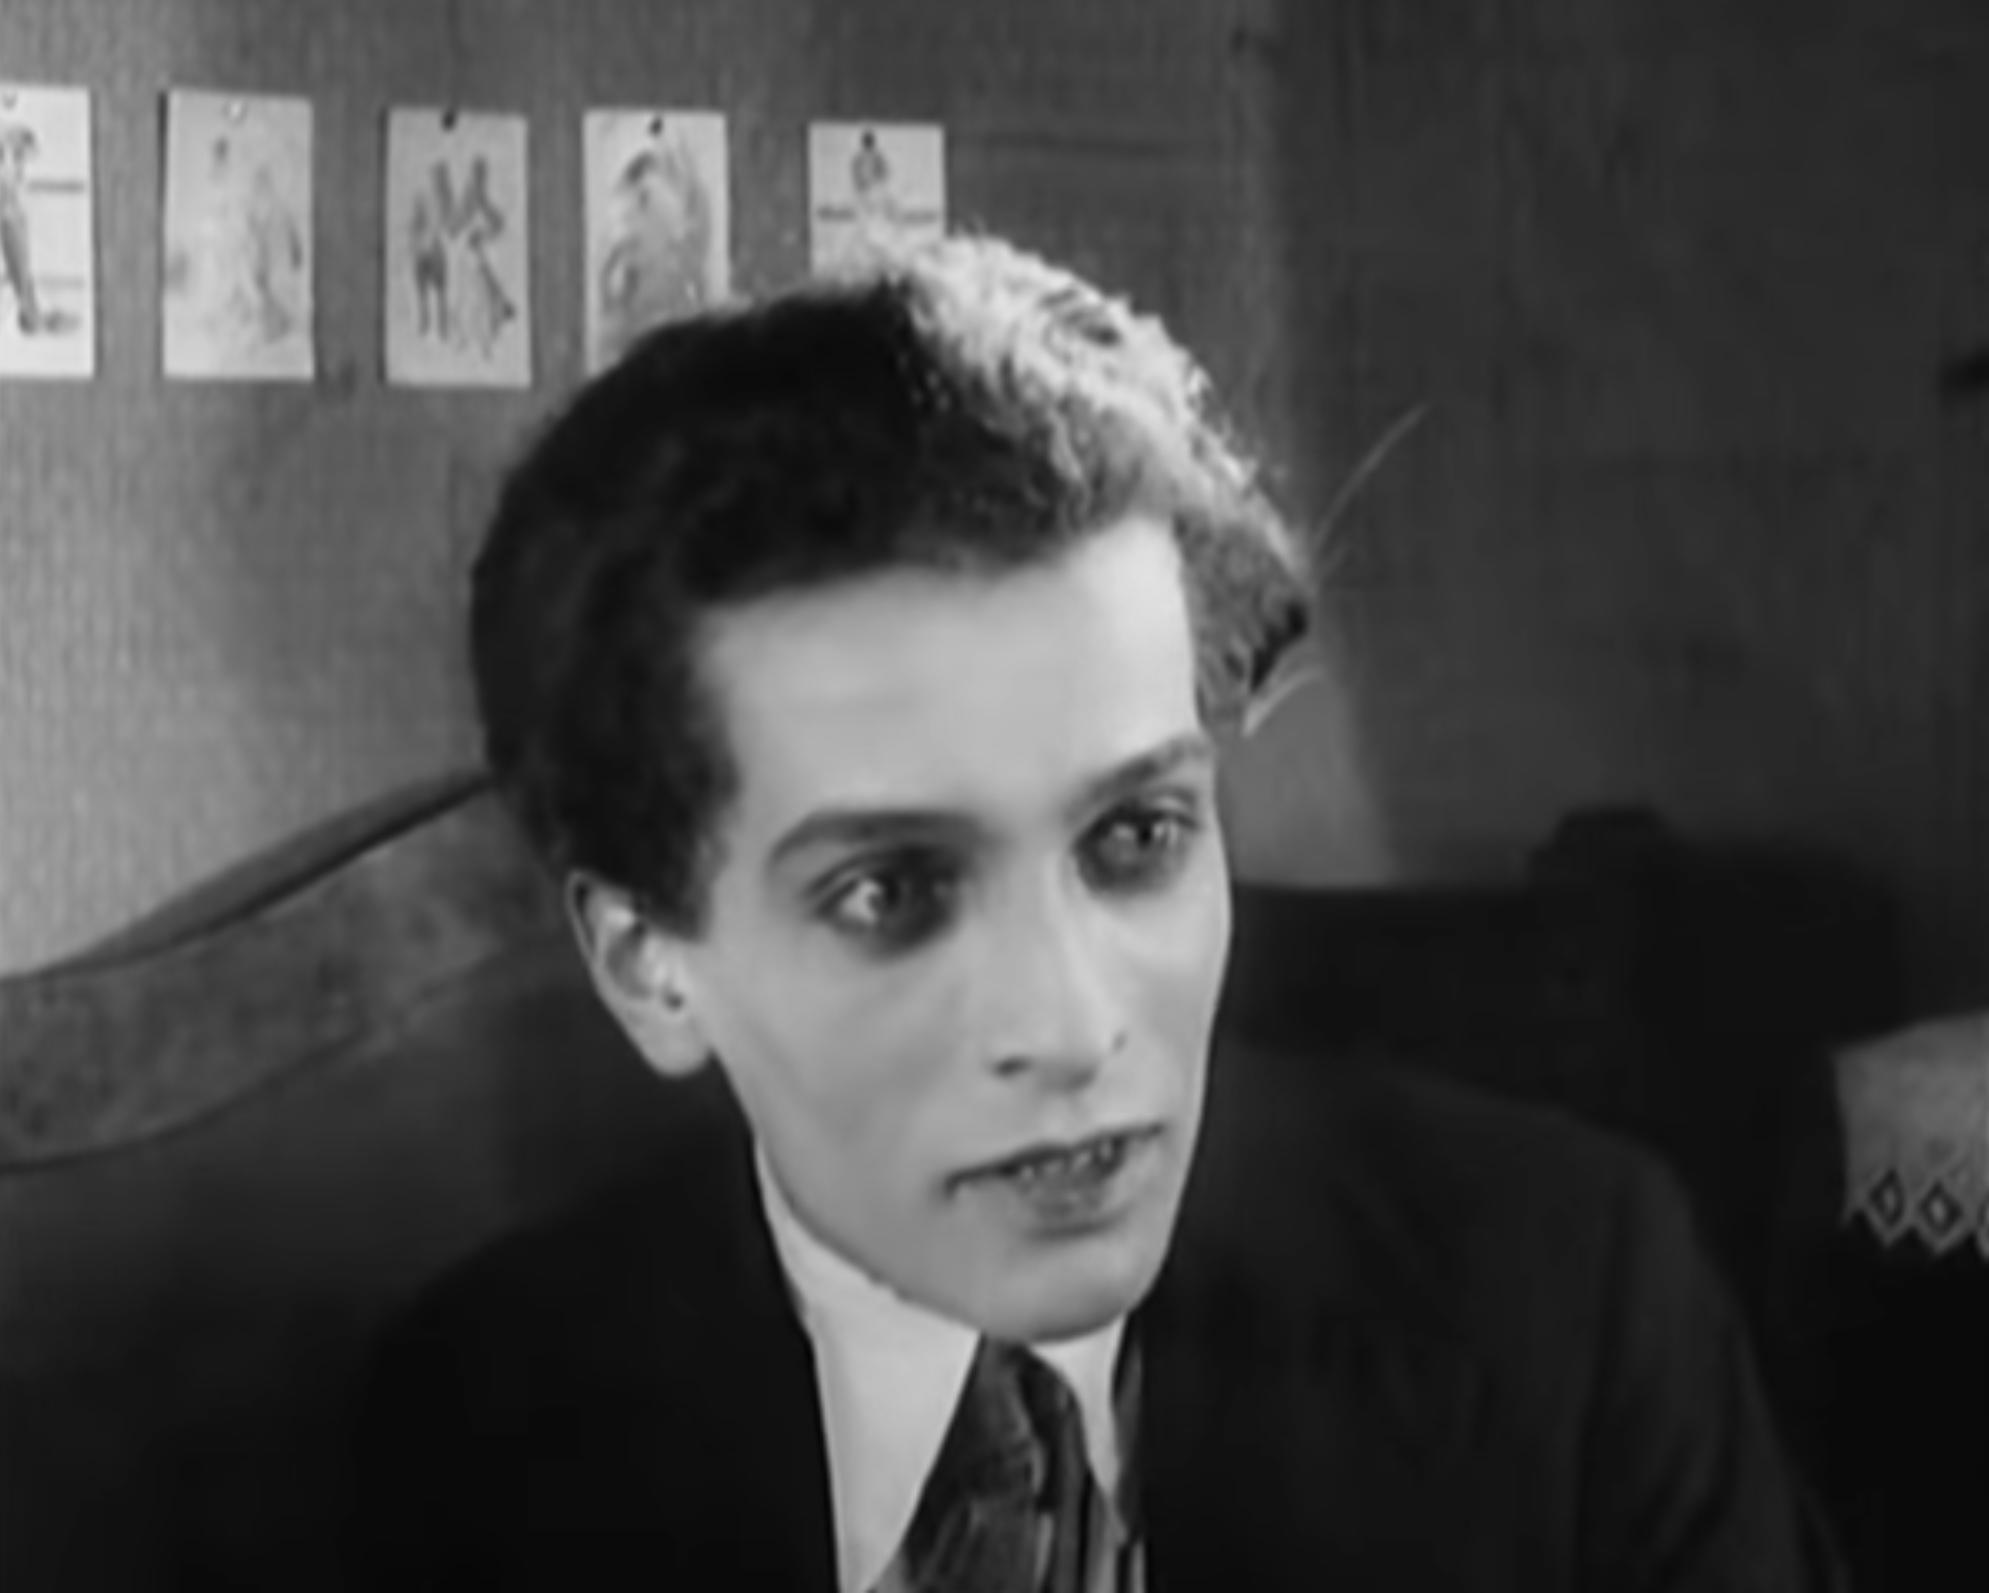 Menilmontant (1926) by director Dimitri Kirsanoff